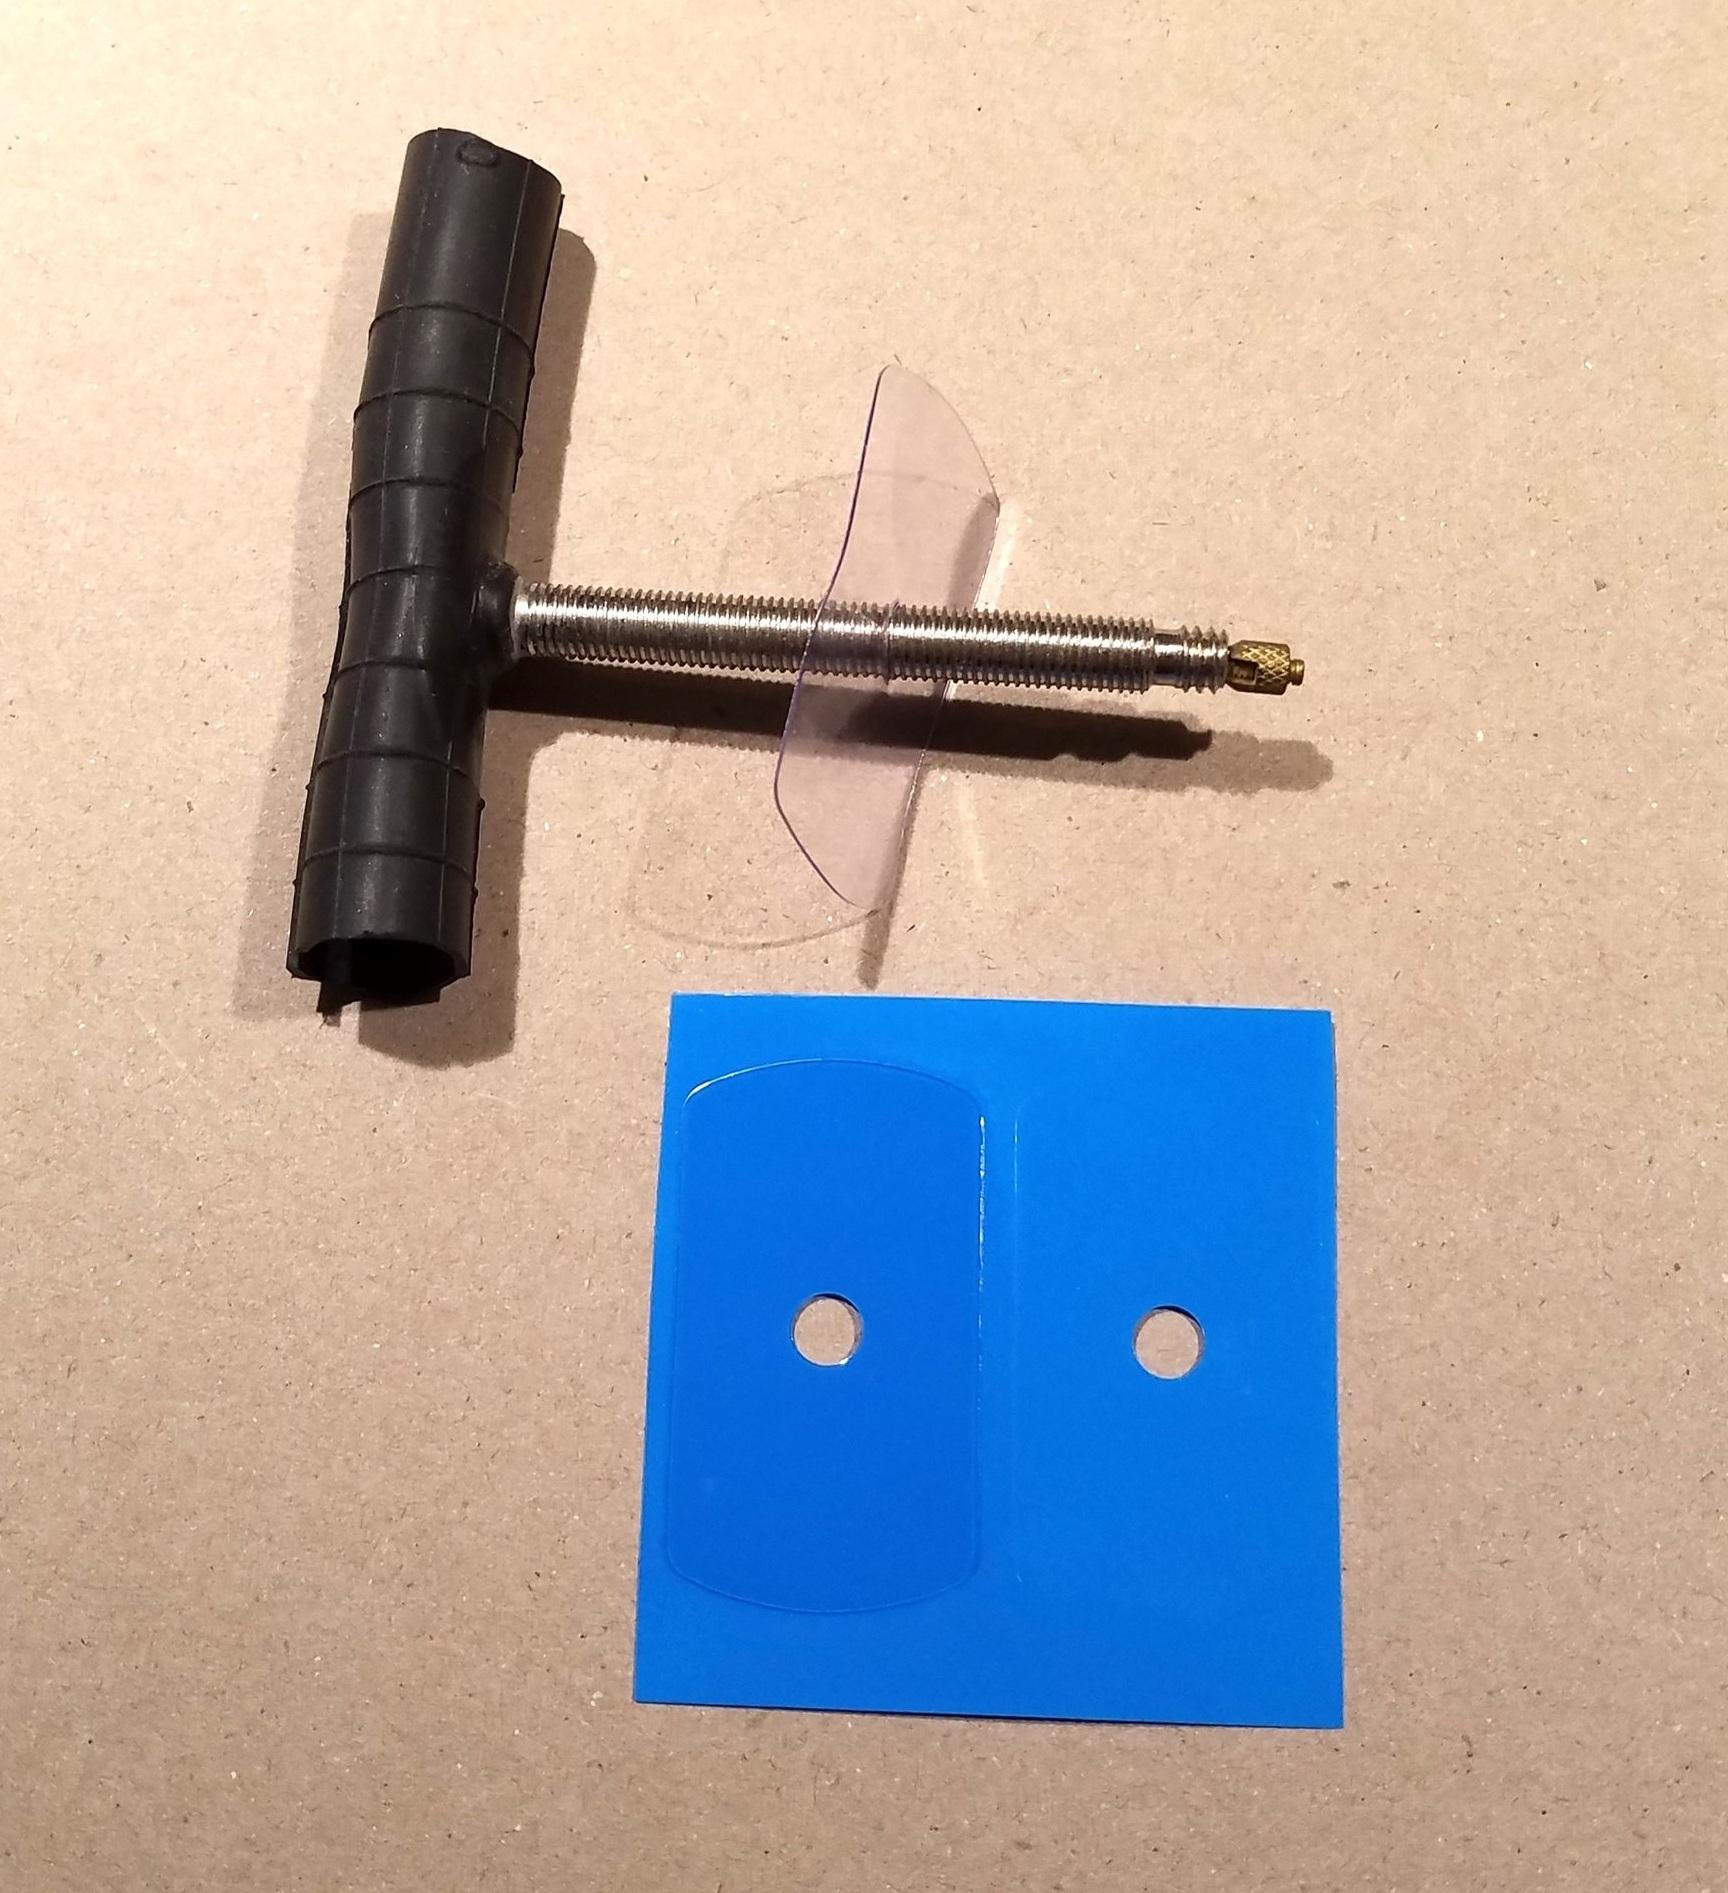 BIKETUBE valve anti-rattle sticker